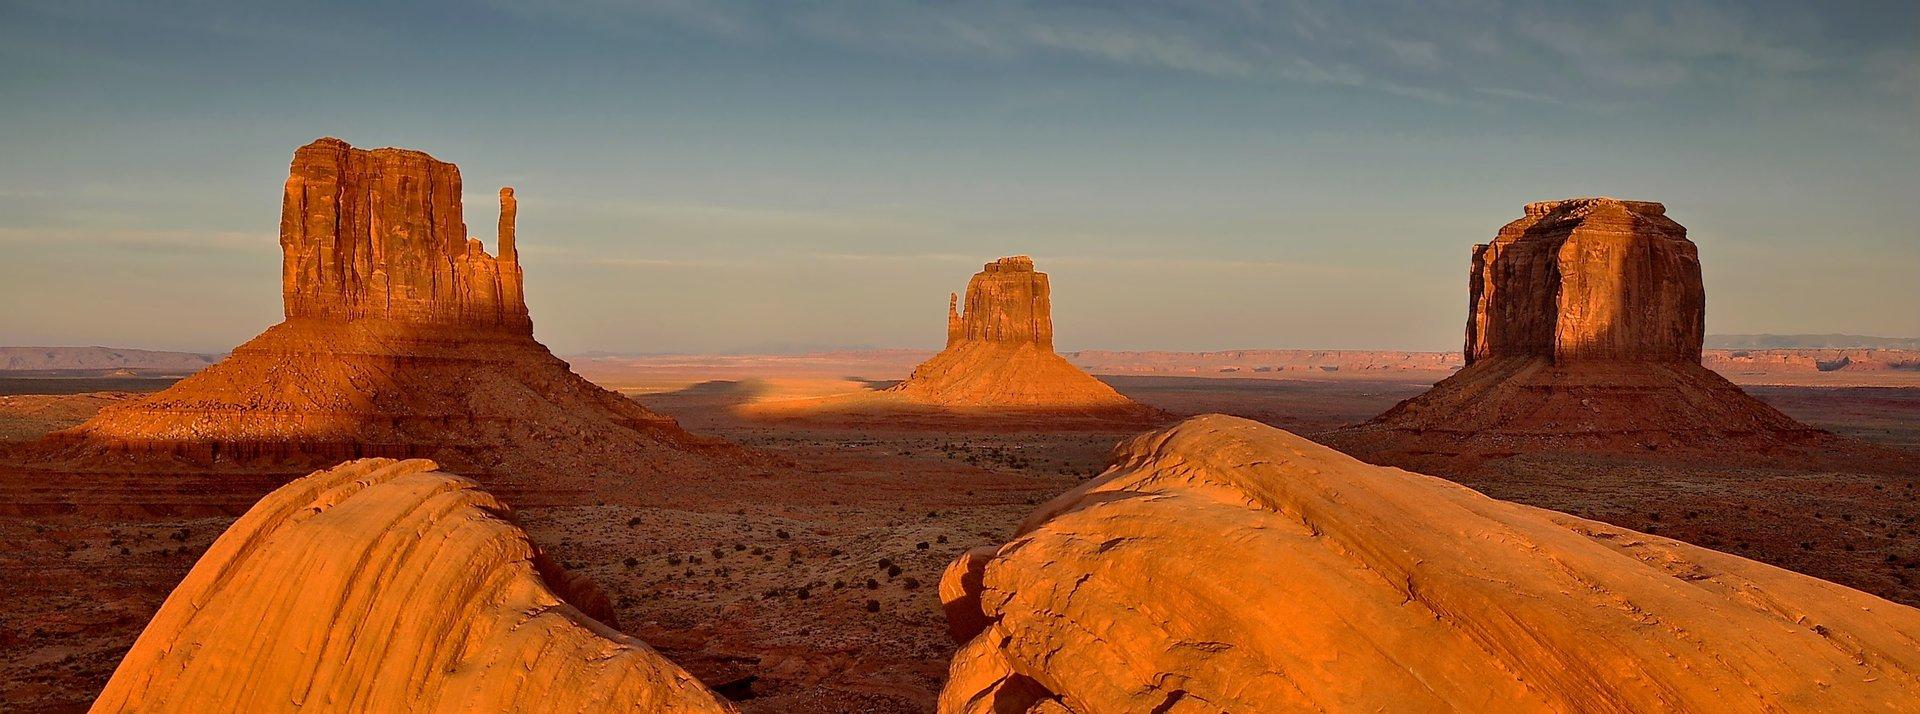 Monument Valley | Author BoyanYankov | PHOTO FORUM